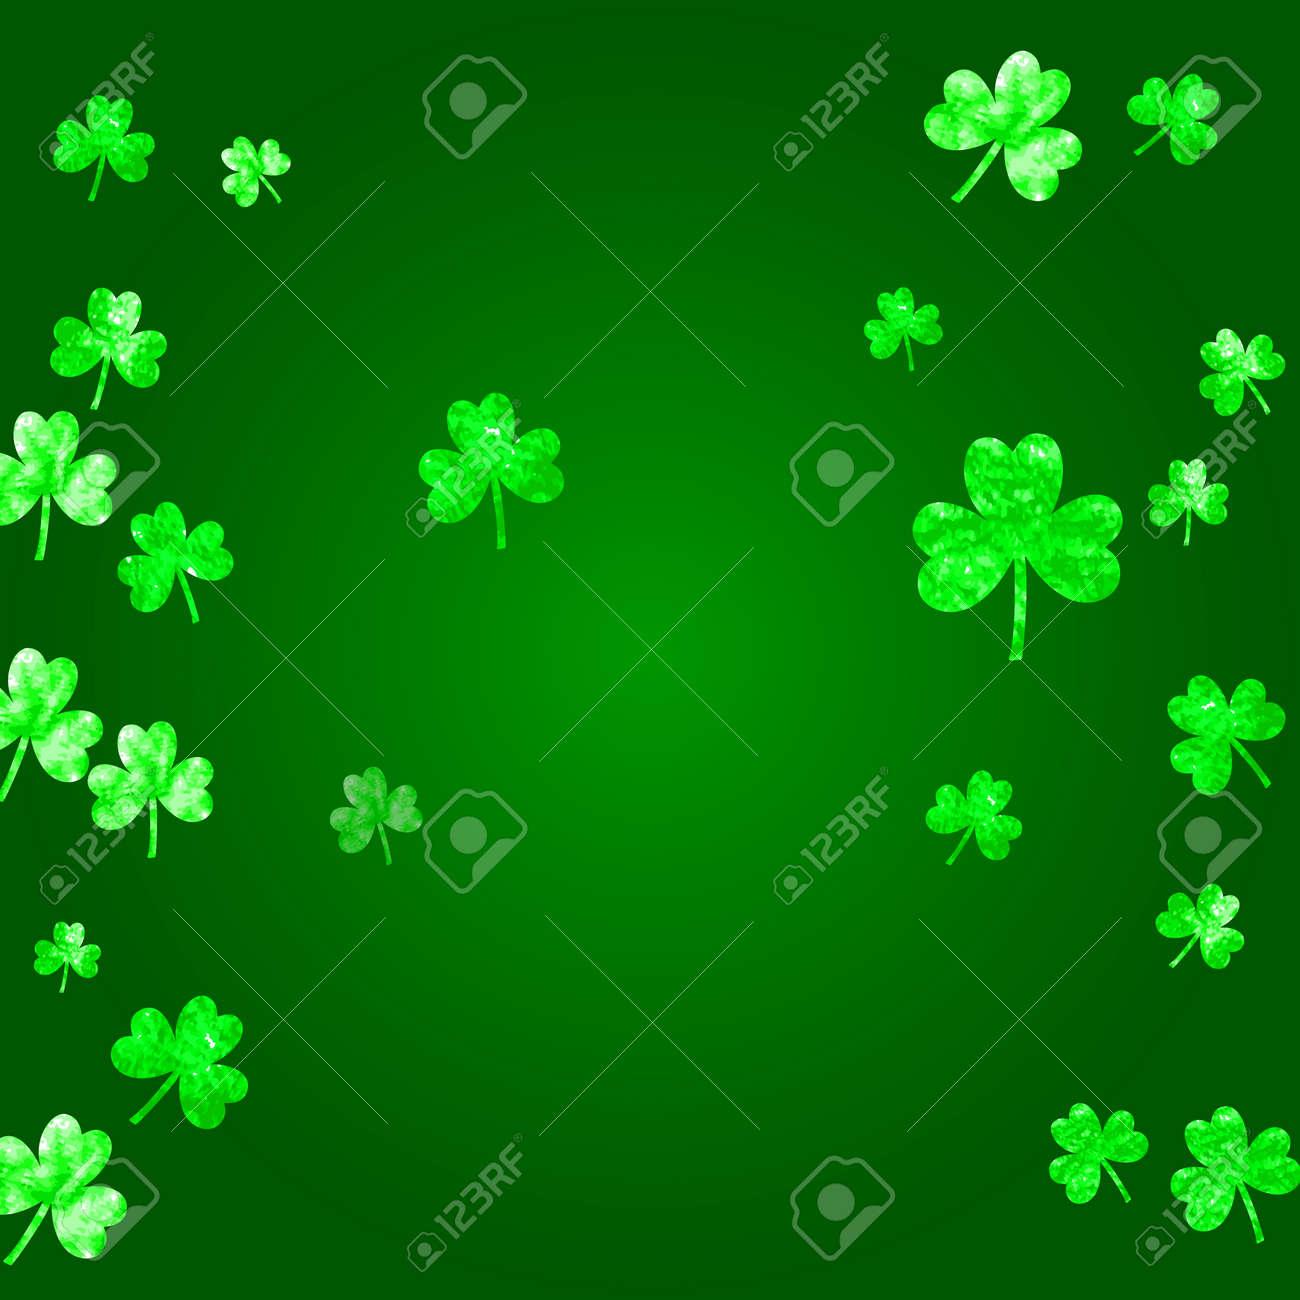 Saint Patricks Day Background With Shamrock Lucky Trefoil Confetti